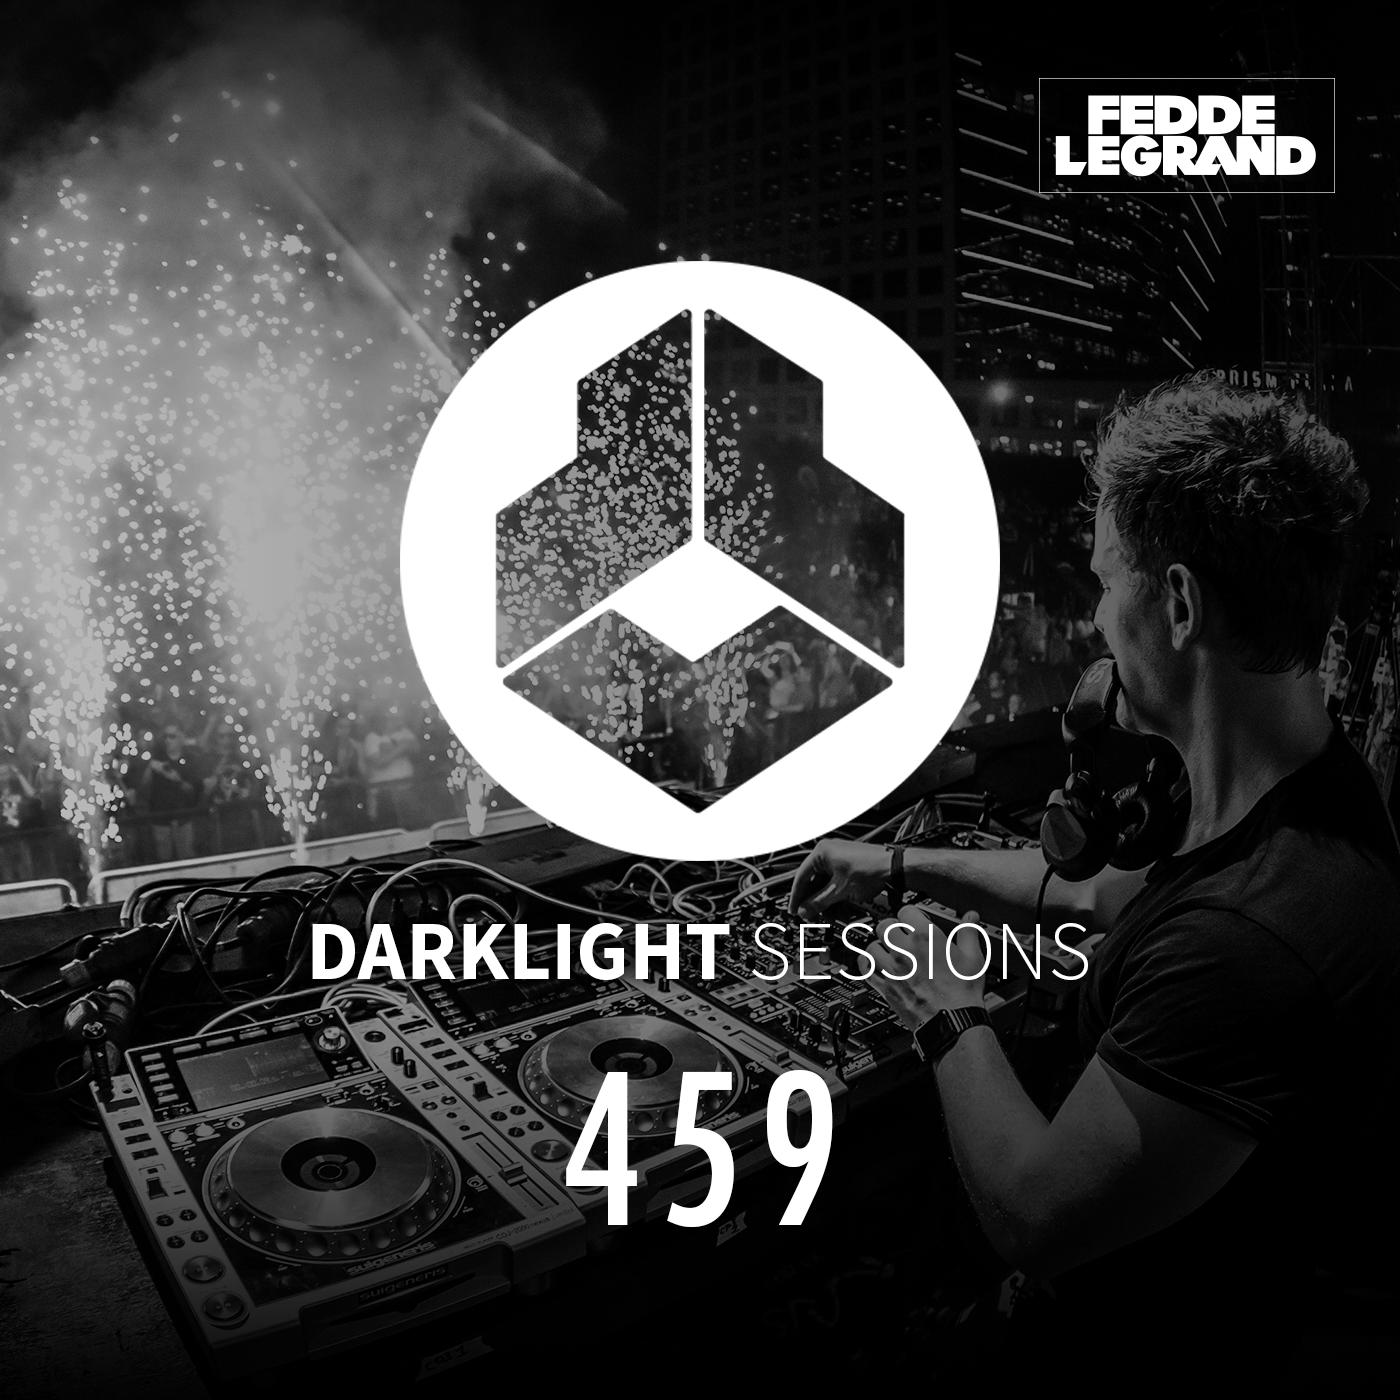 Darklight Sessions 459